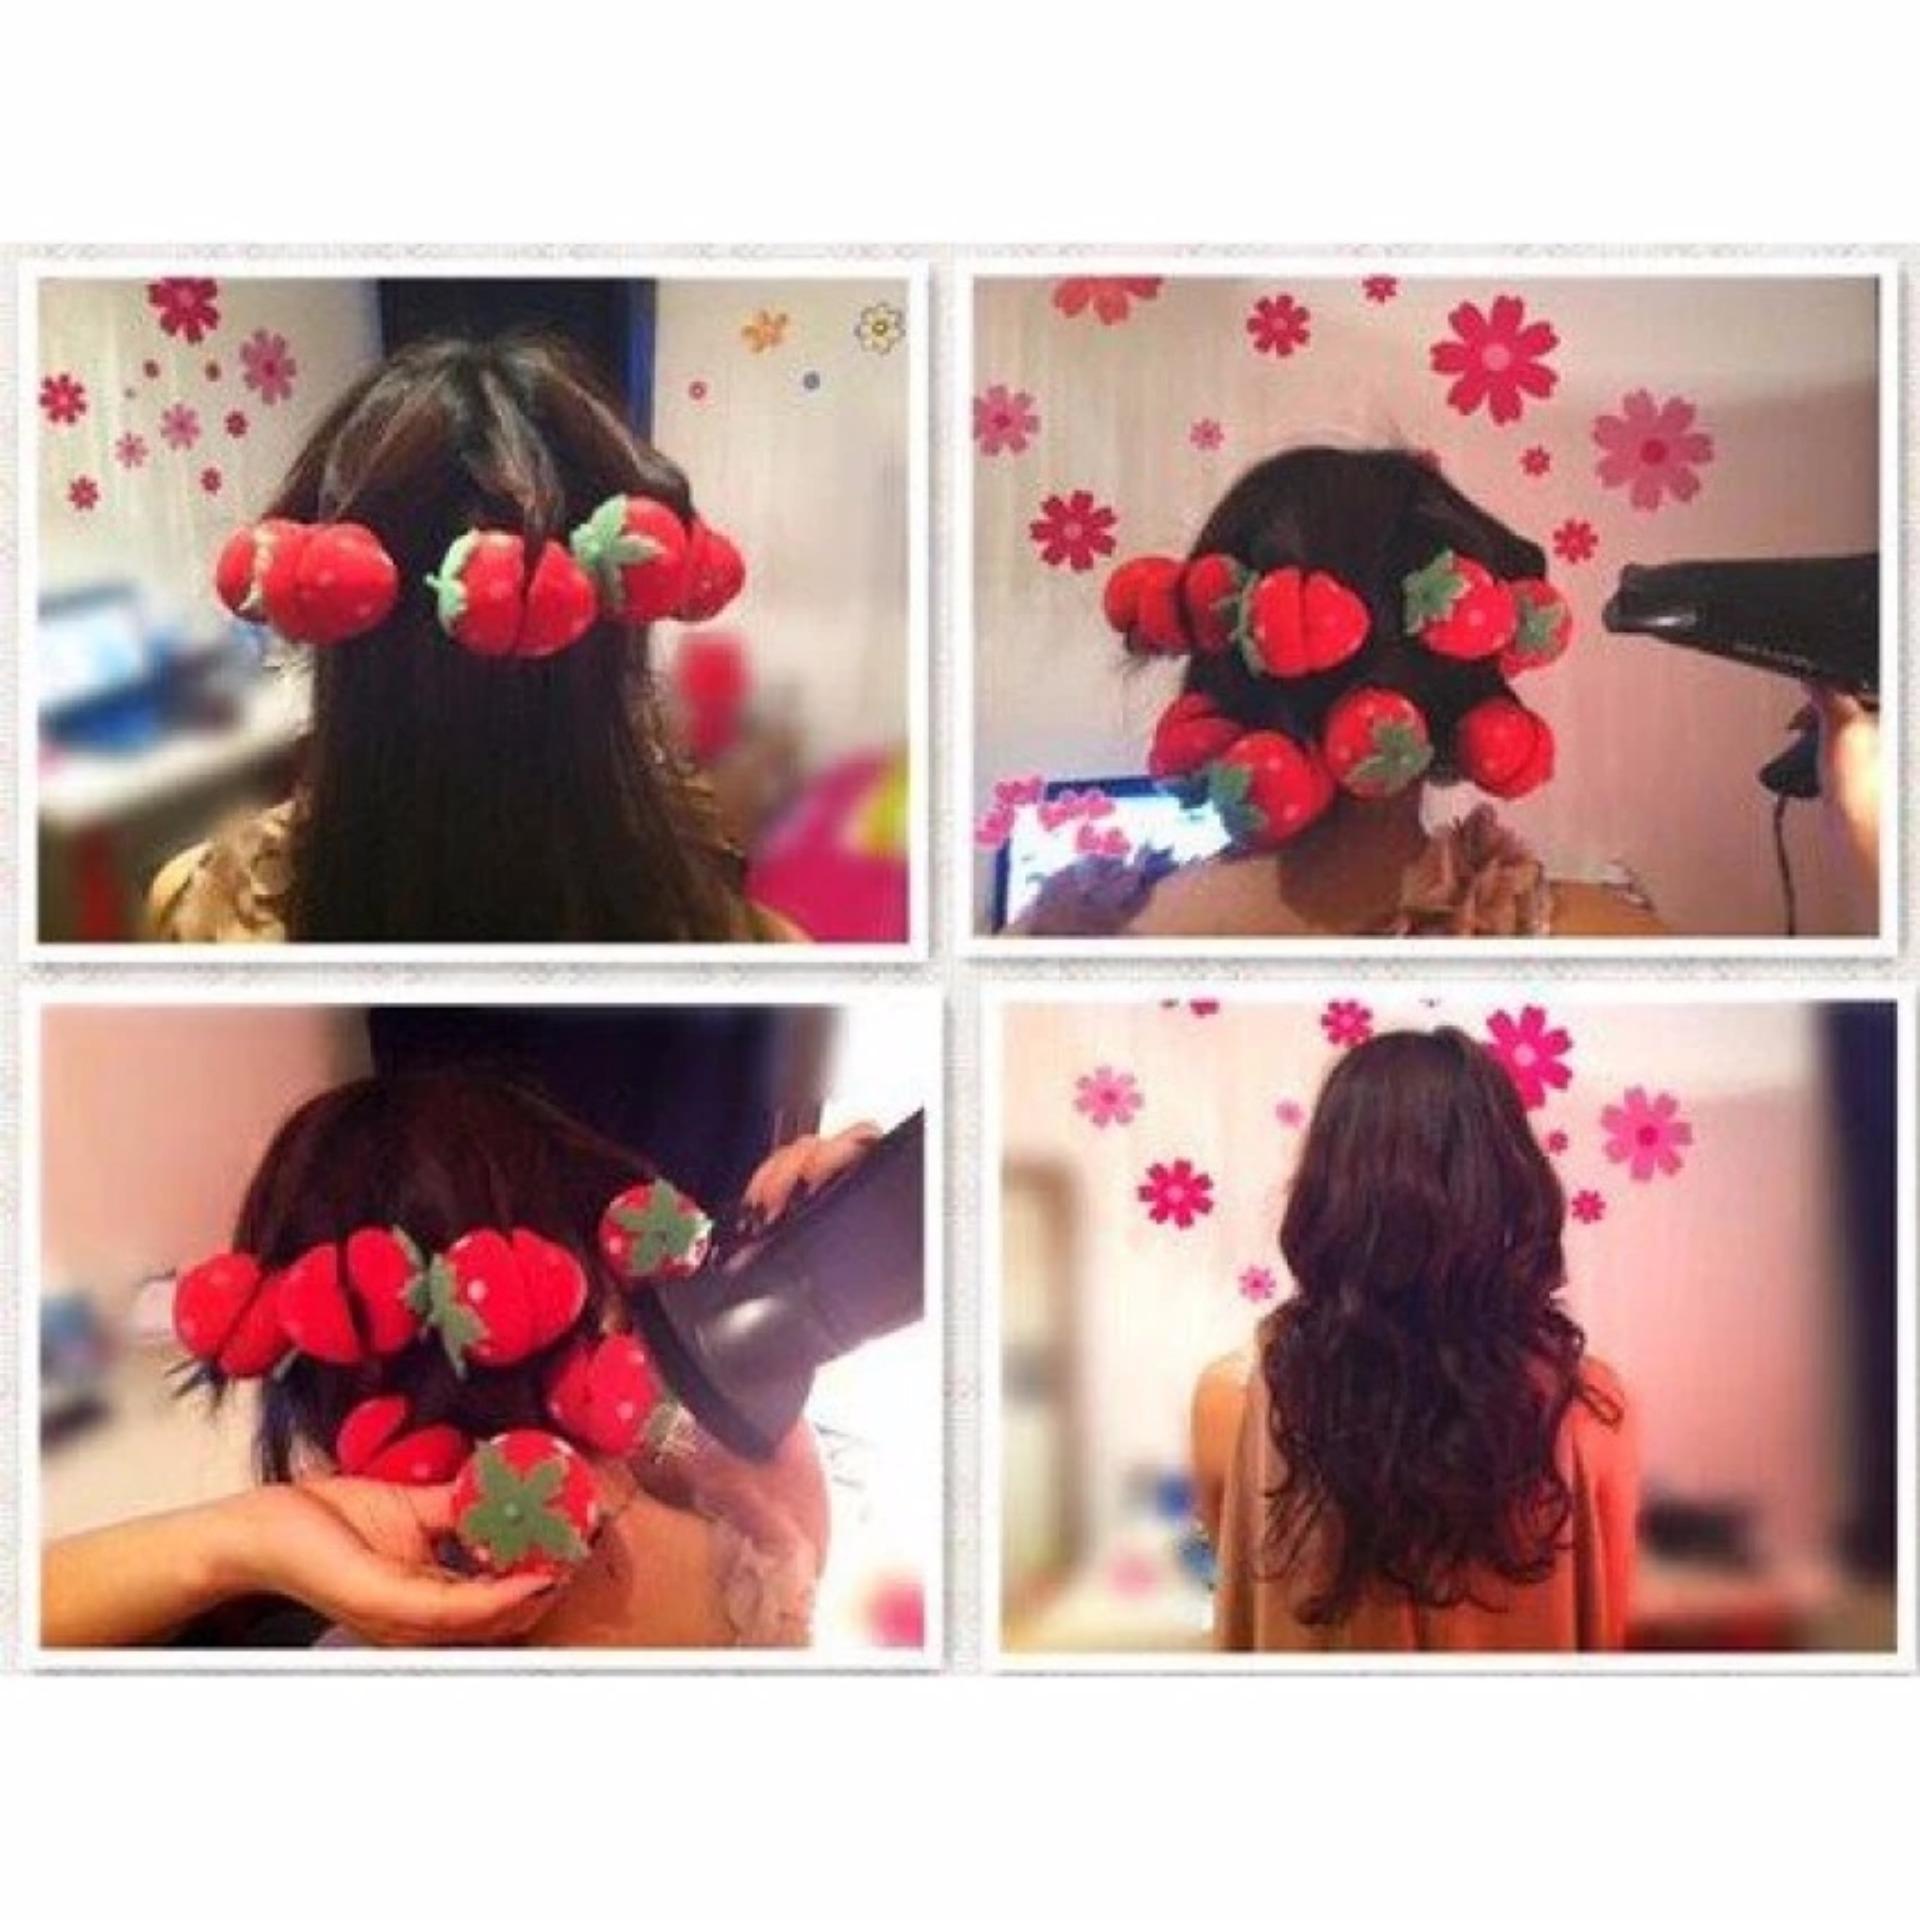 Online Murah Sponge Strawberry Roll Hair Curler Rambut Ikal Alami Catokan In Styler Rotating Iron Flash Sale Tanpa Catokisi 6 Pcs